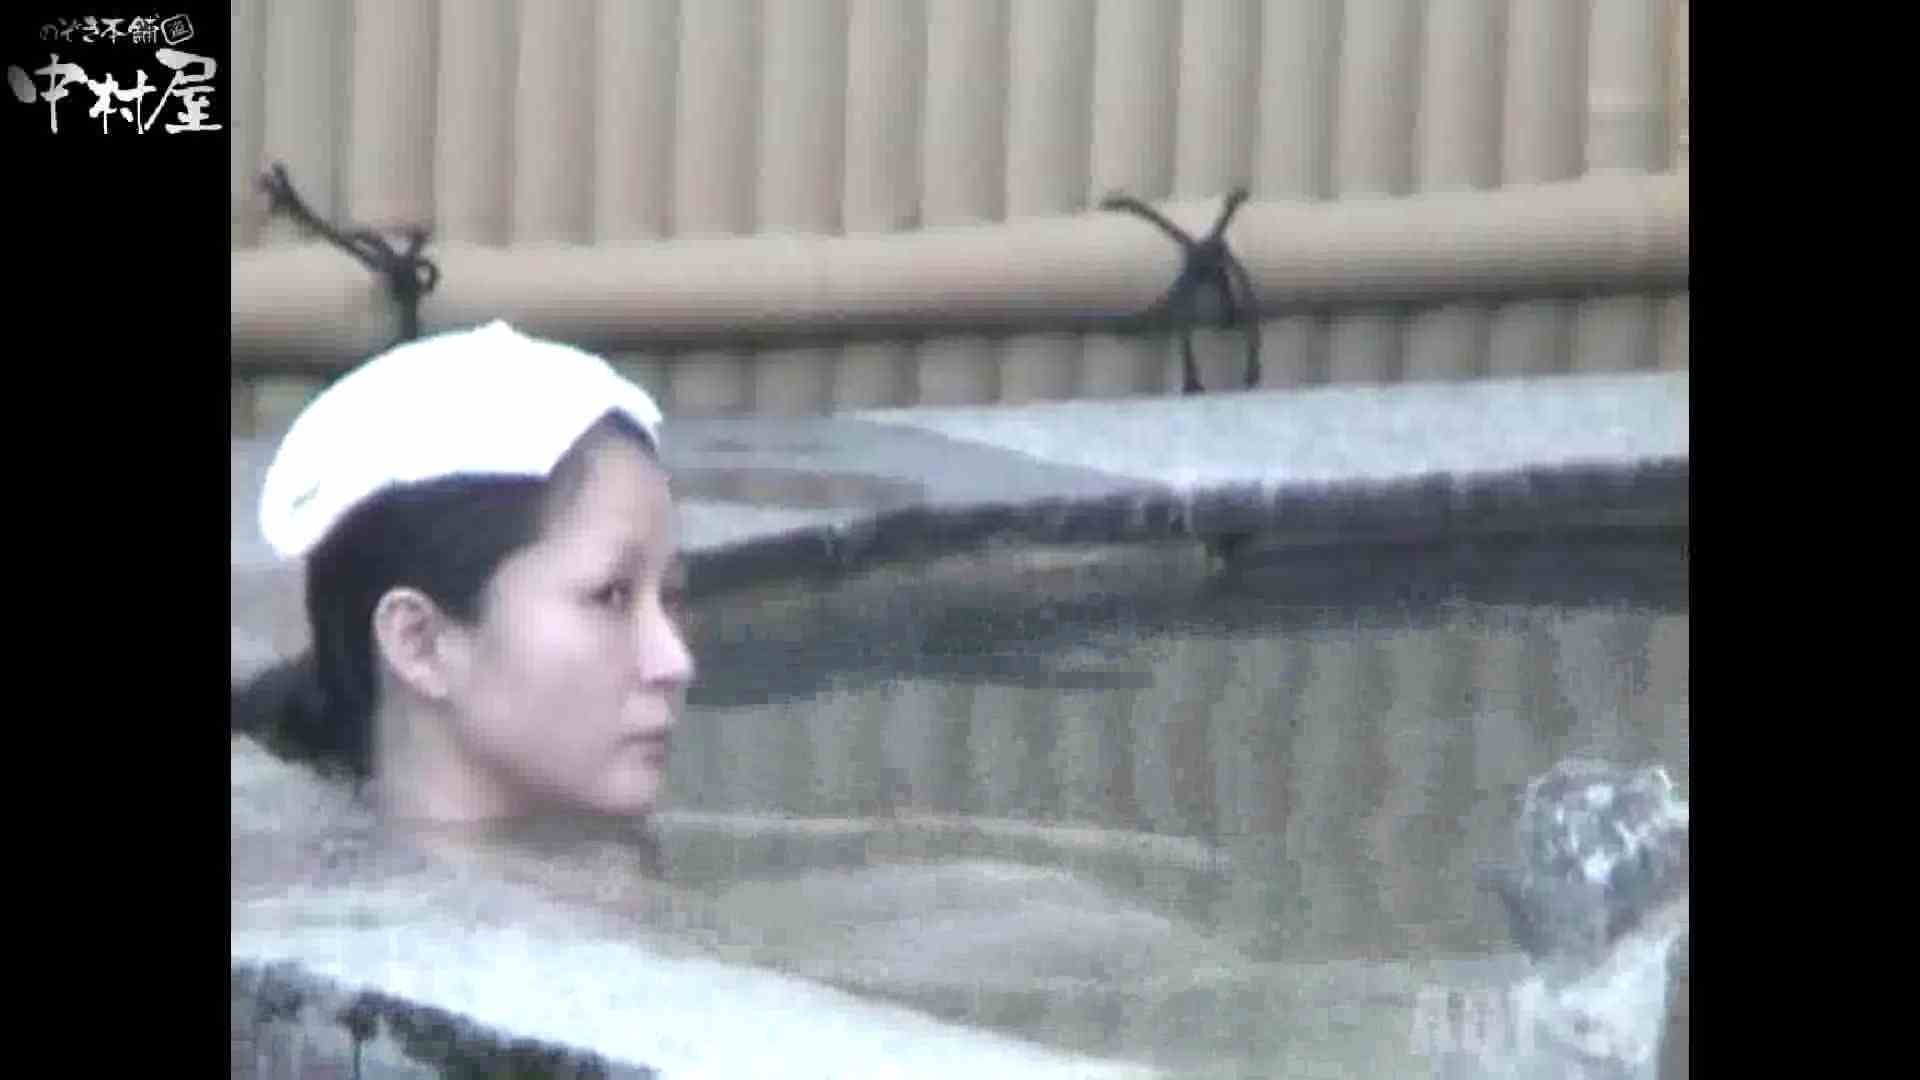 Aquaな露天風呂Vol.880潜入盗撮露天風呂十六判湯 其の六 露天 | 潜入シリーズ  95pic 48